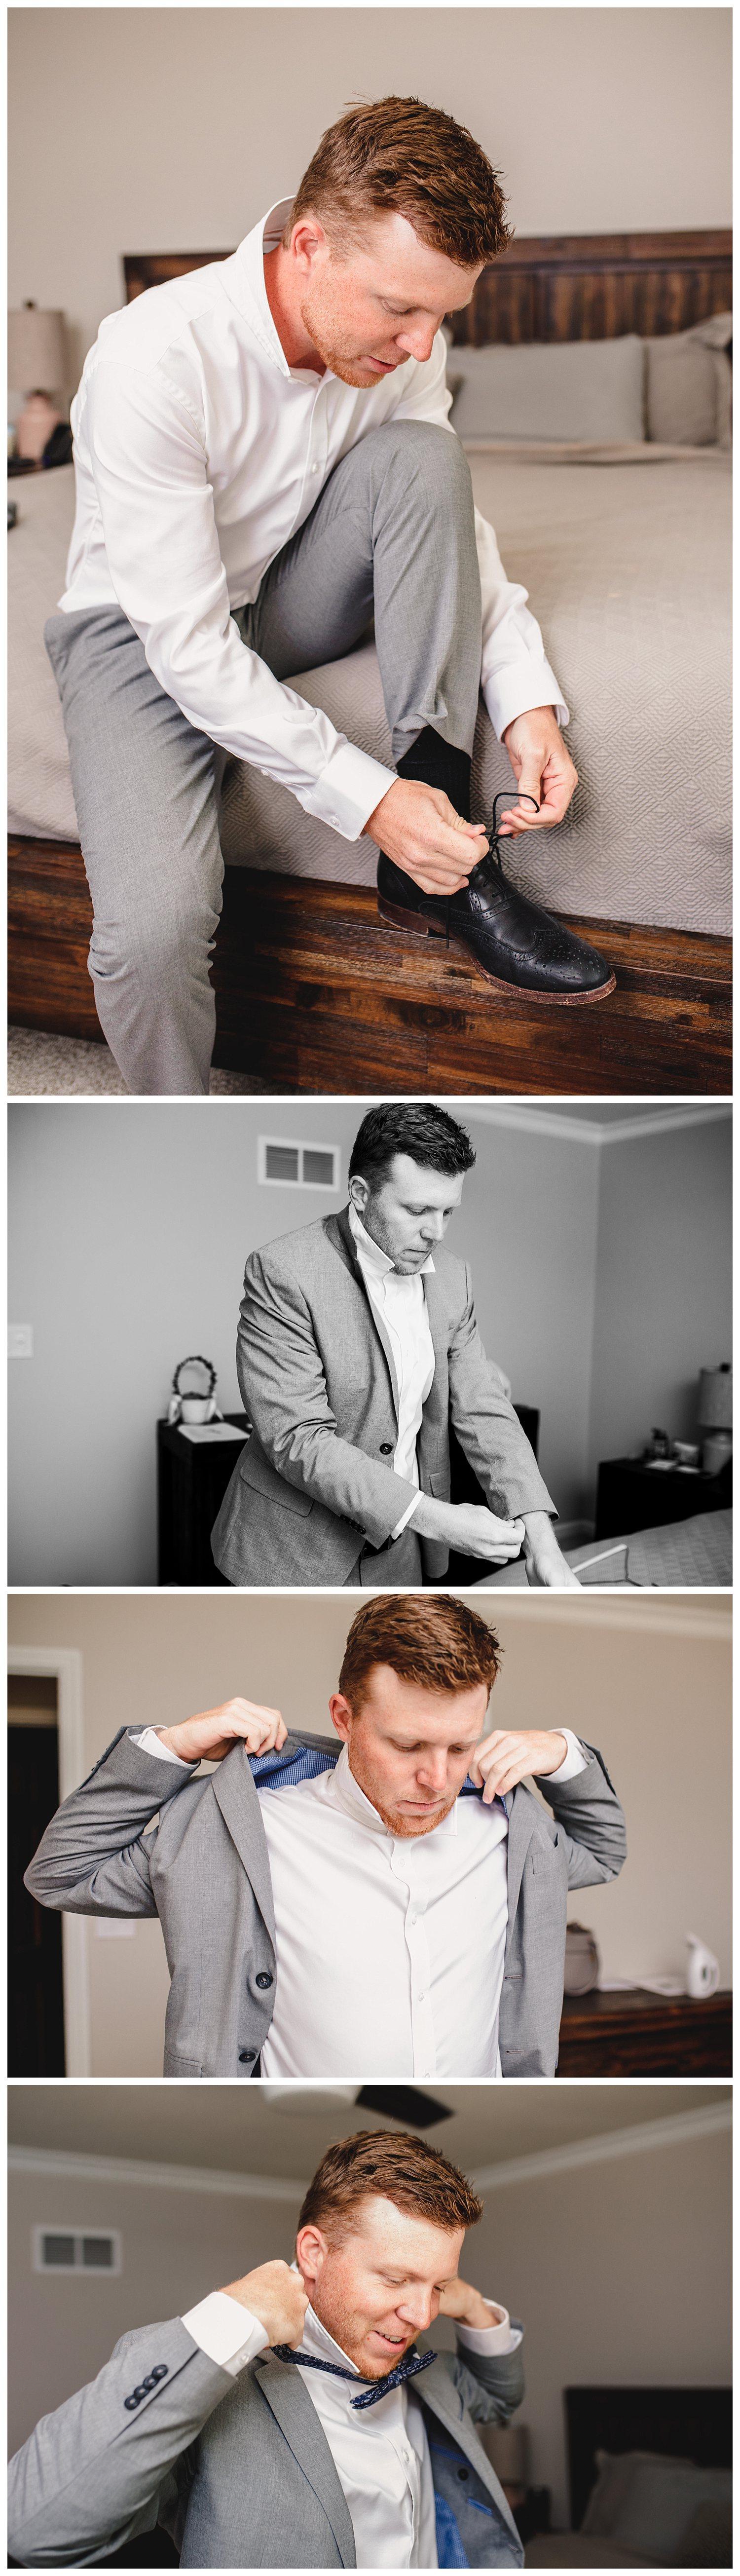 Kelsey_Diane_Photography_Kansas_City_Engagement_Wedding_Photographer_Midwest_Traveling_Missouri_Lee_Andrew_Hall_And_Garden_Blue_Springs_Wedding_Clayton_Kimberly_Summer_Wedding_0809.jpg